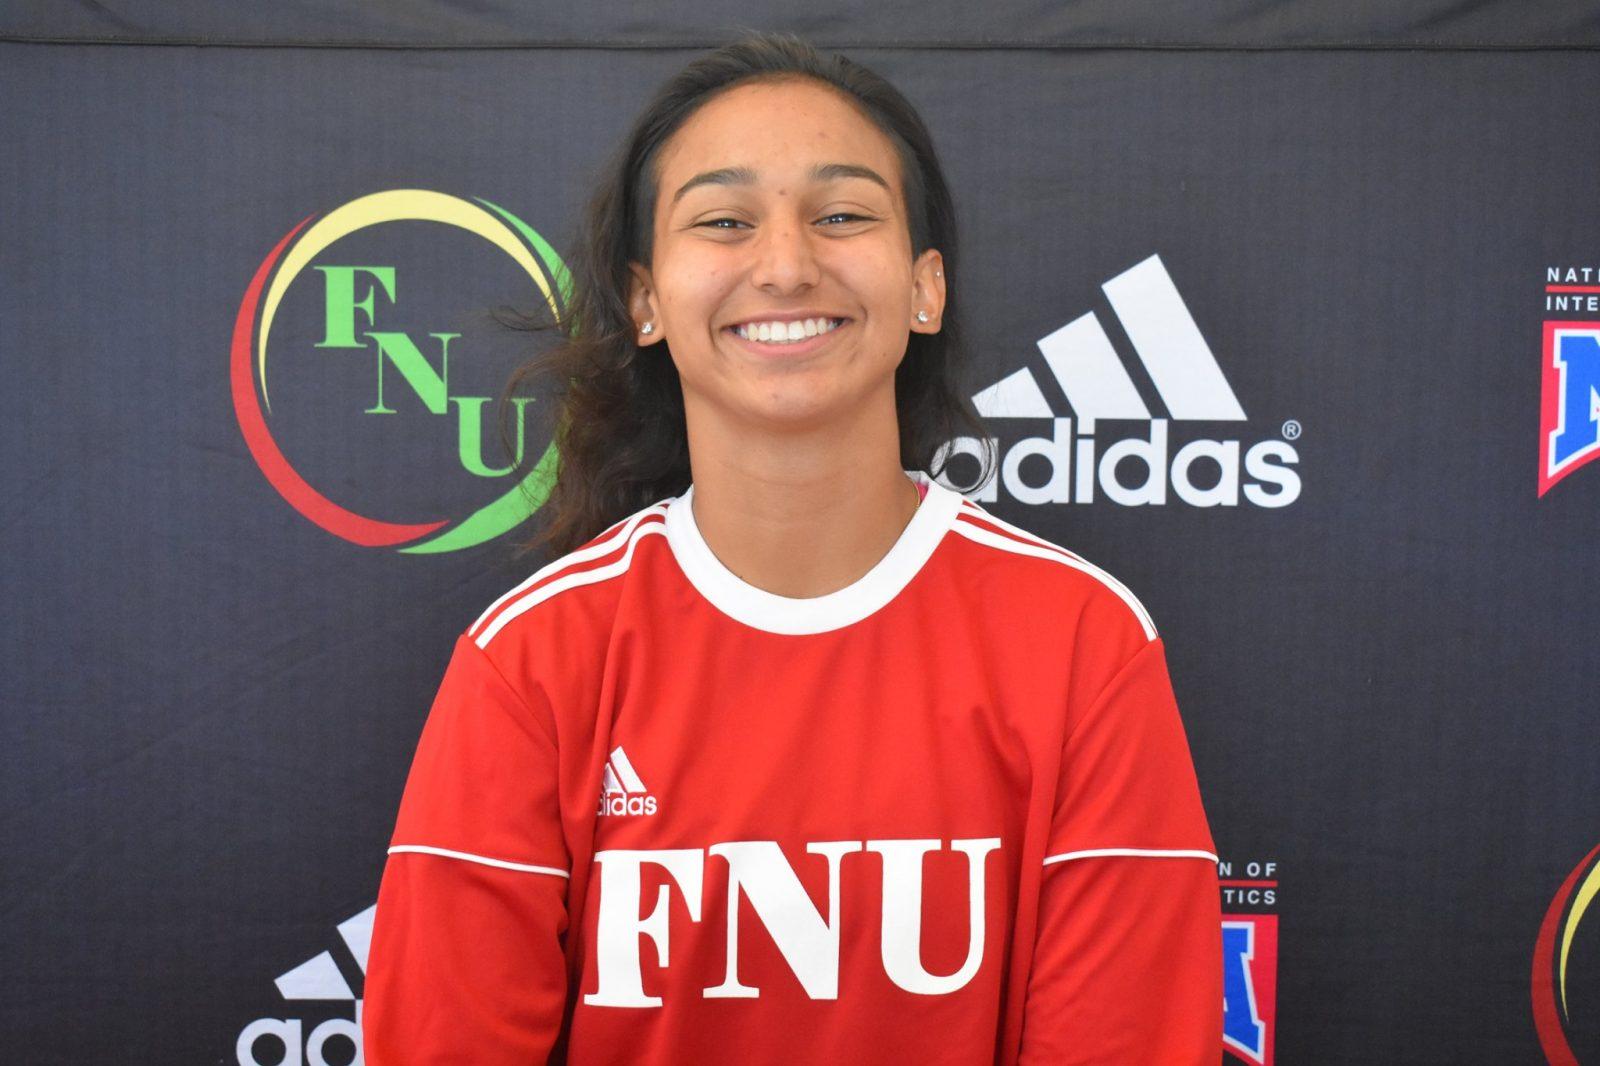 FNU Women's soccer player Selene Vazques